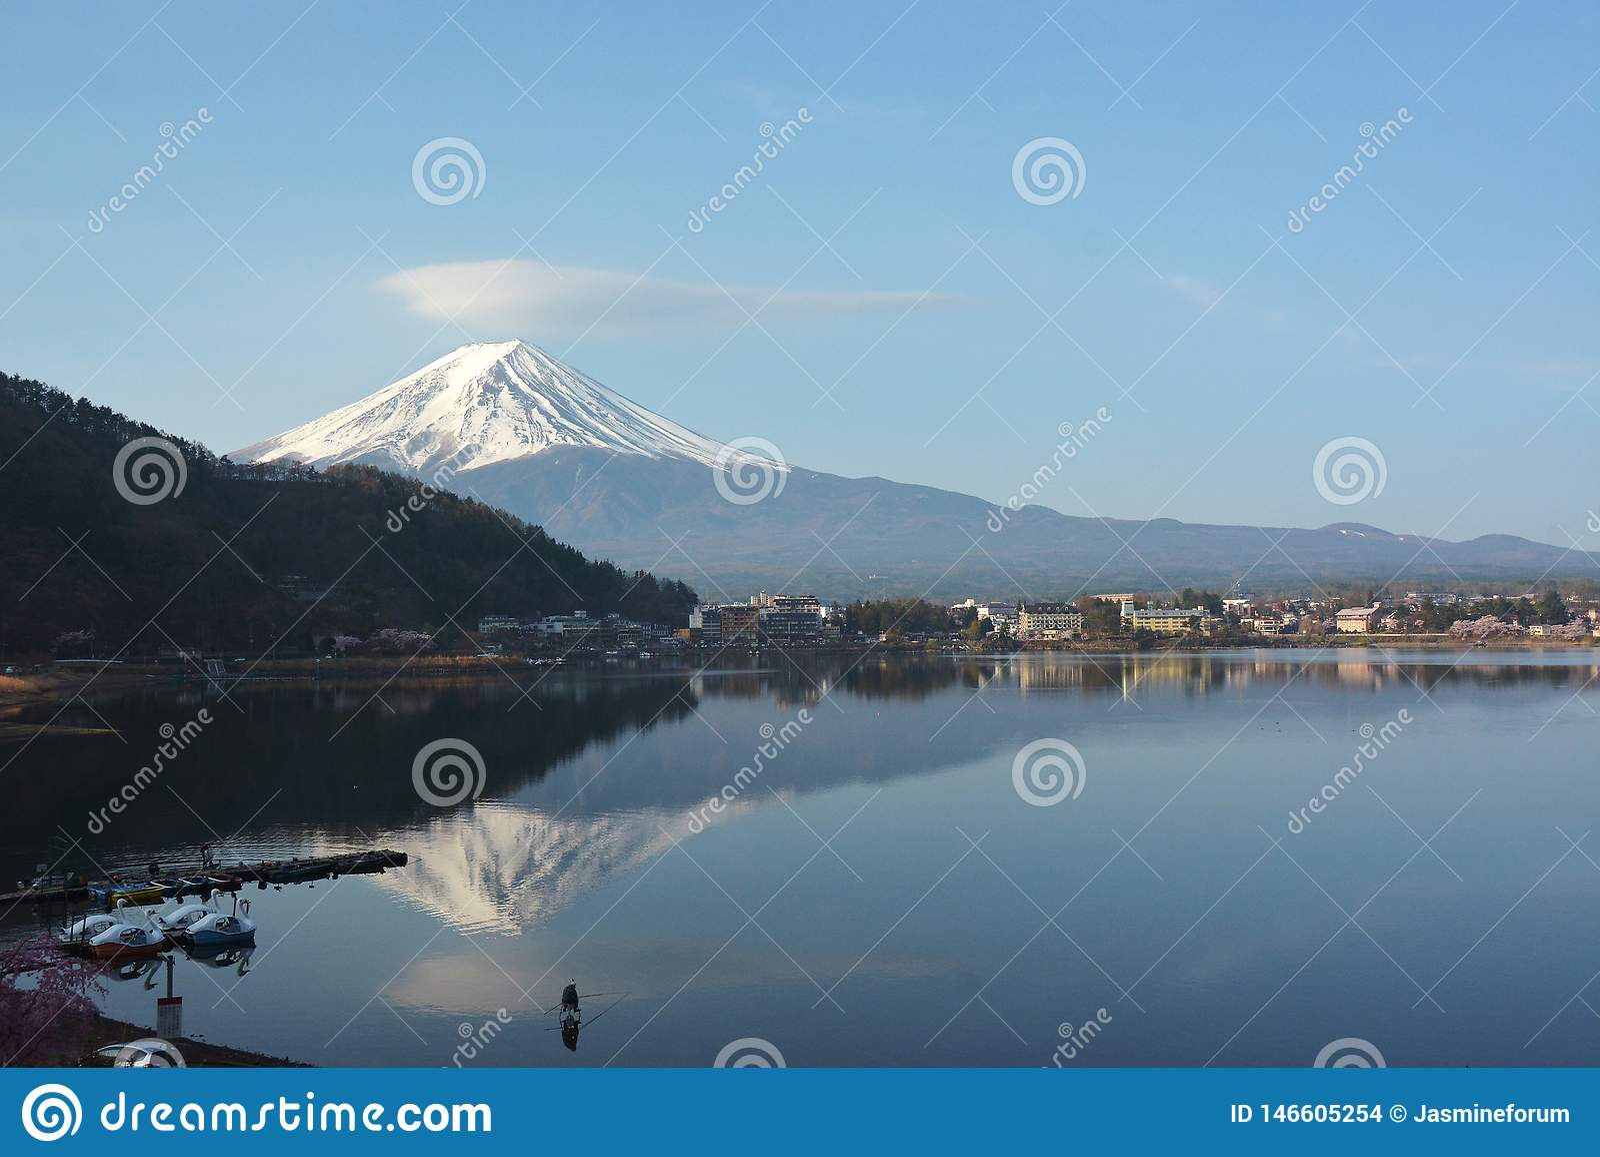 Mountain Fuji in lake Kawaguchi